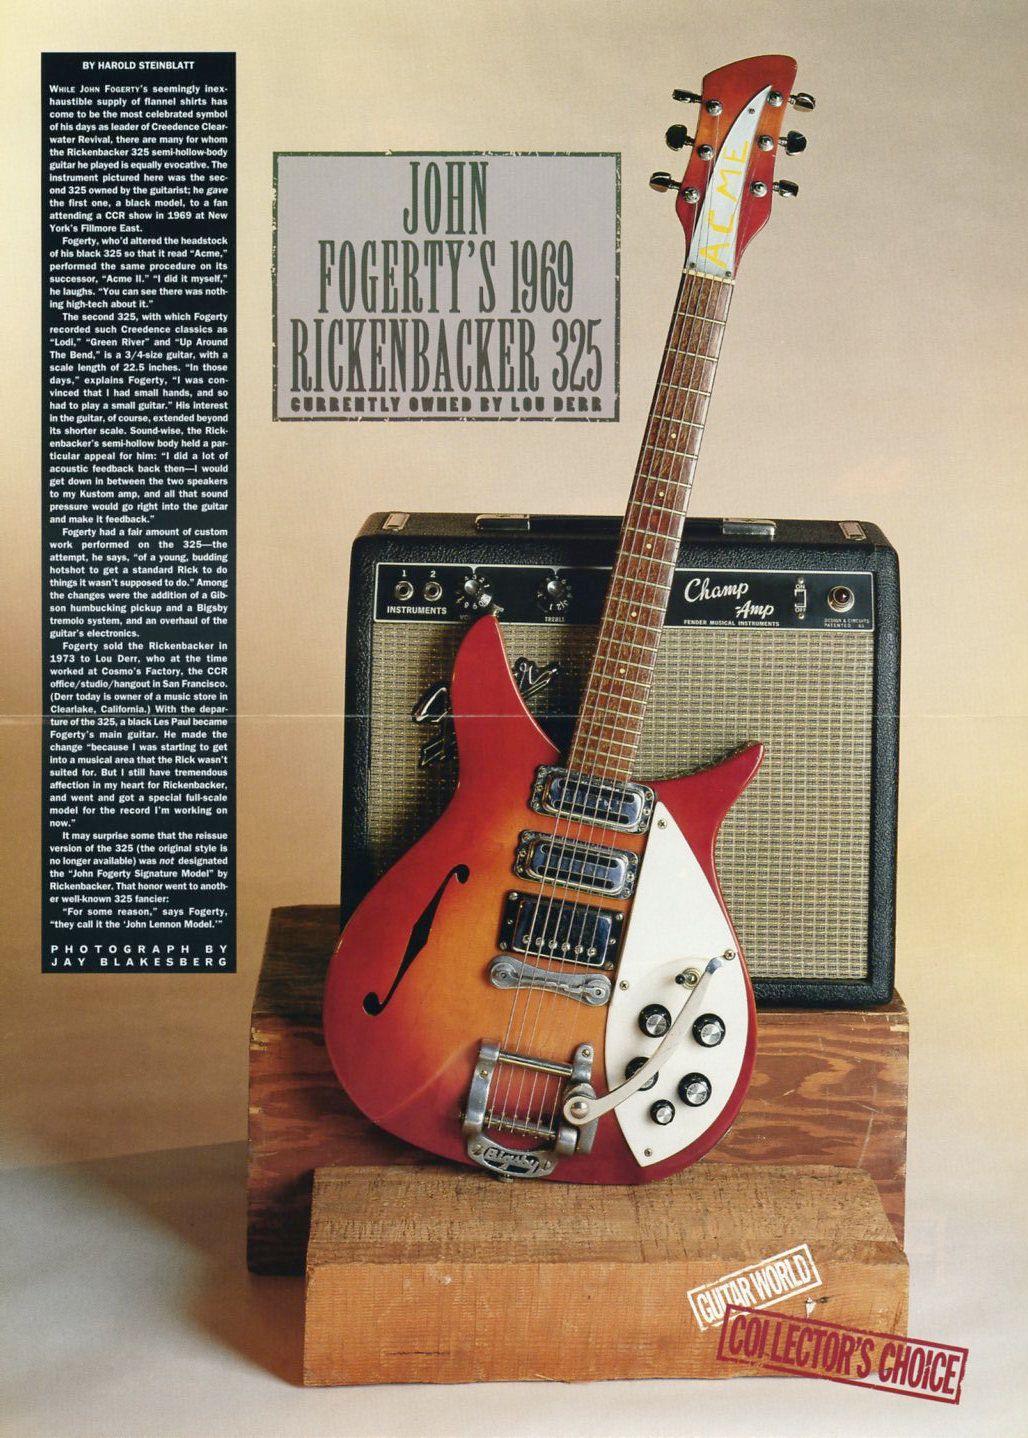 1958 Rickenbacker 325 Wiring Diagram Diagrams Library1969 Guitar Poster John Fogerty